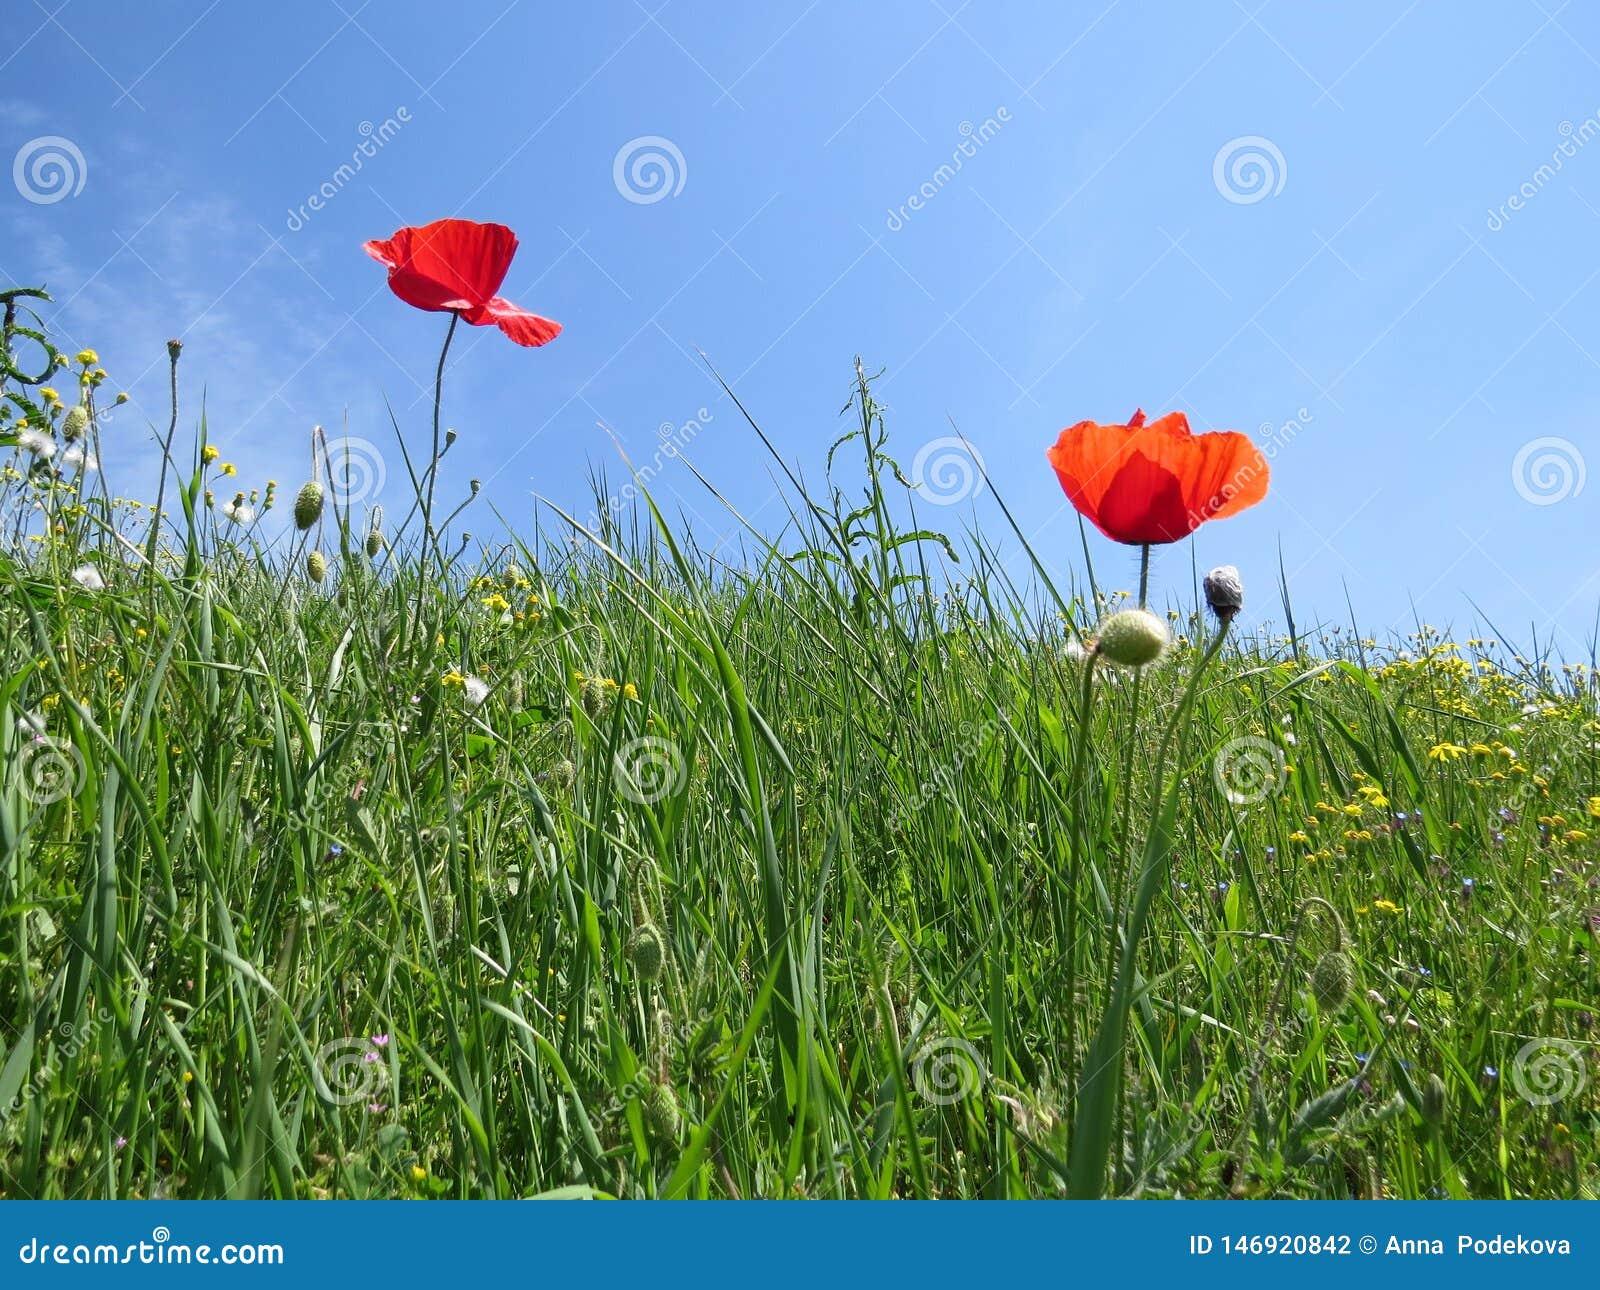 Red poppy flowers in spring meadow